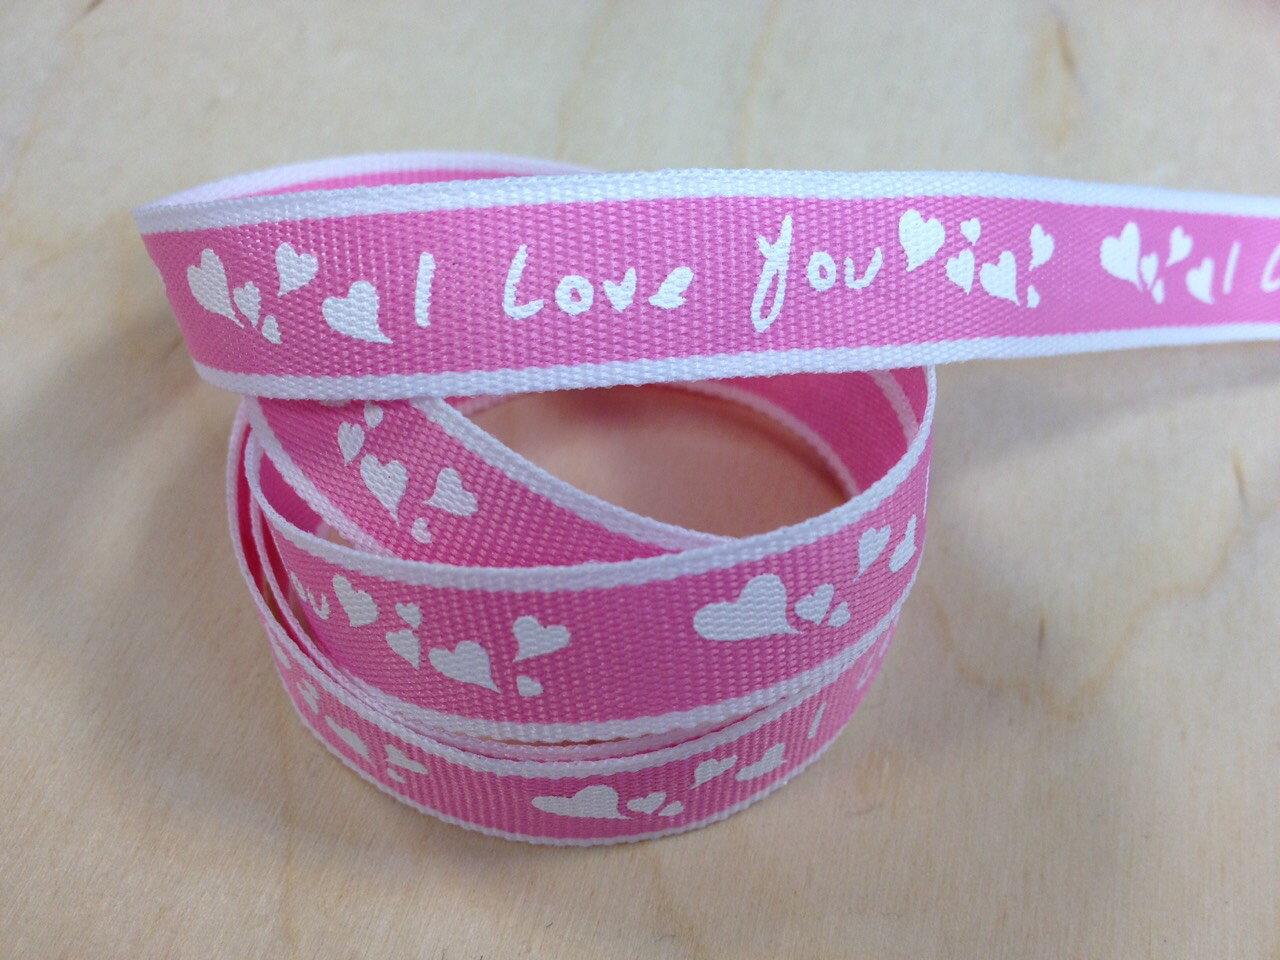 【Crystal Rose緞帶專賣店】love 愛心緞帶 12mm 3碼 (9色) 4